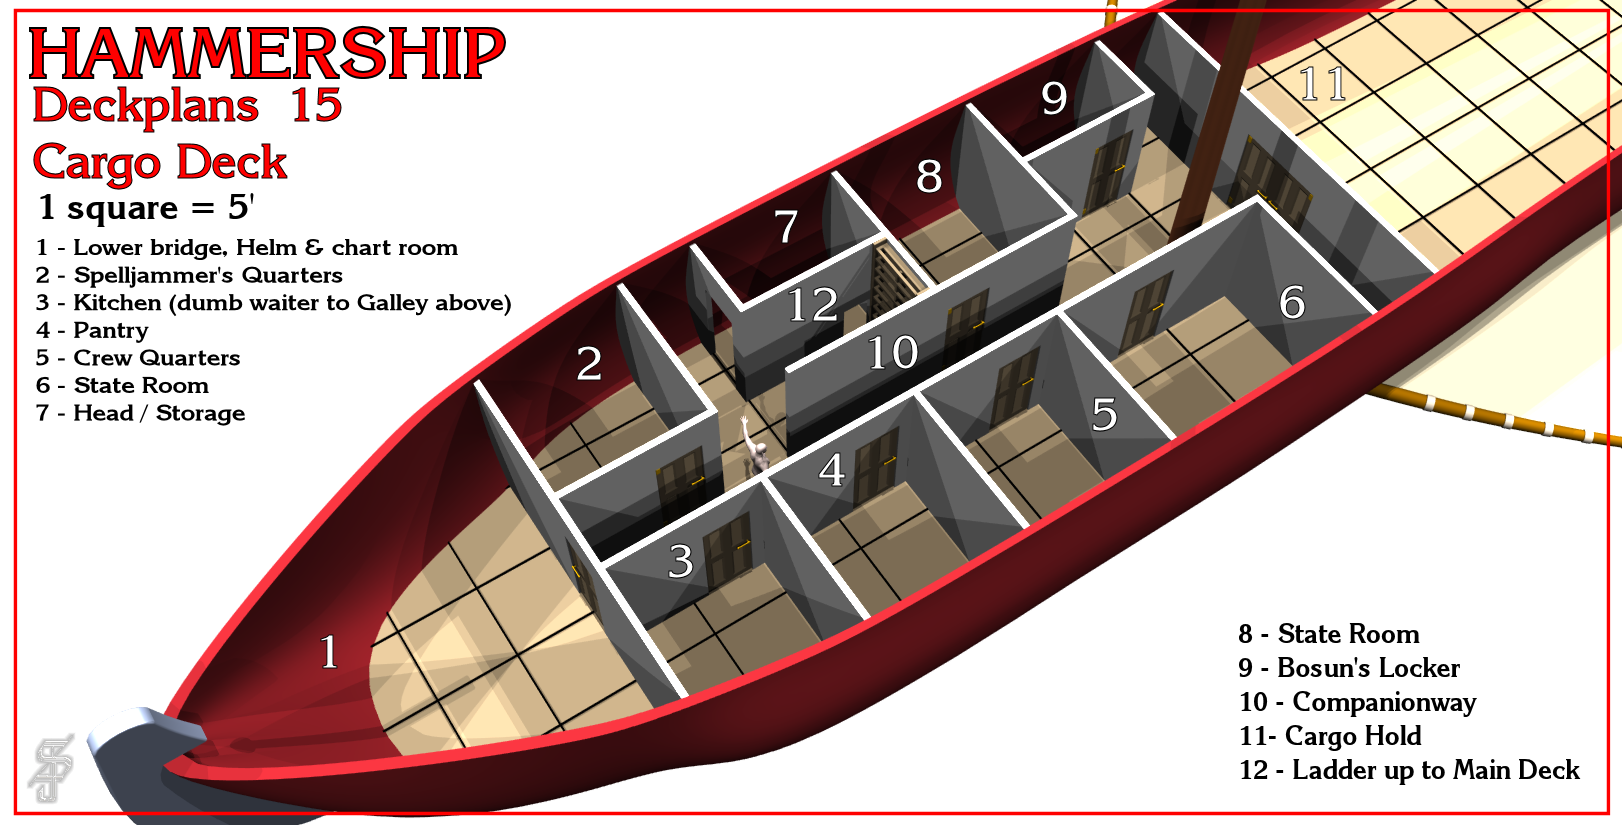 Hammership layout 15